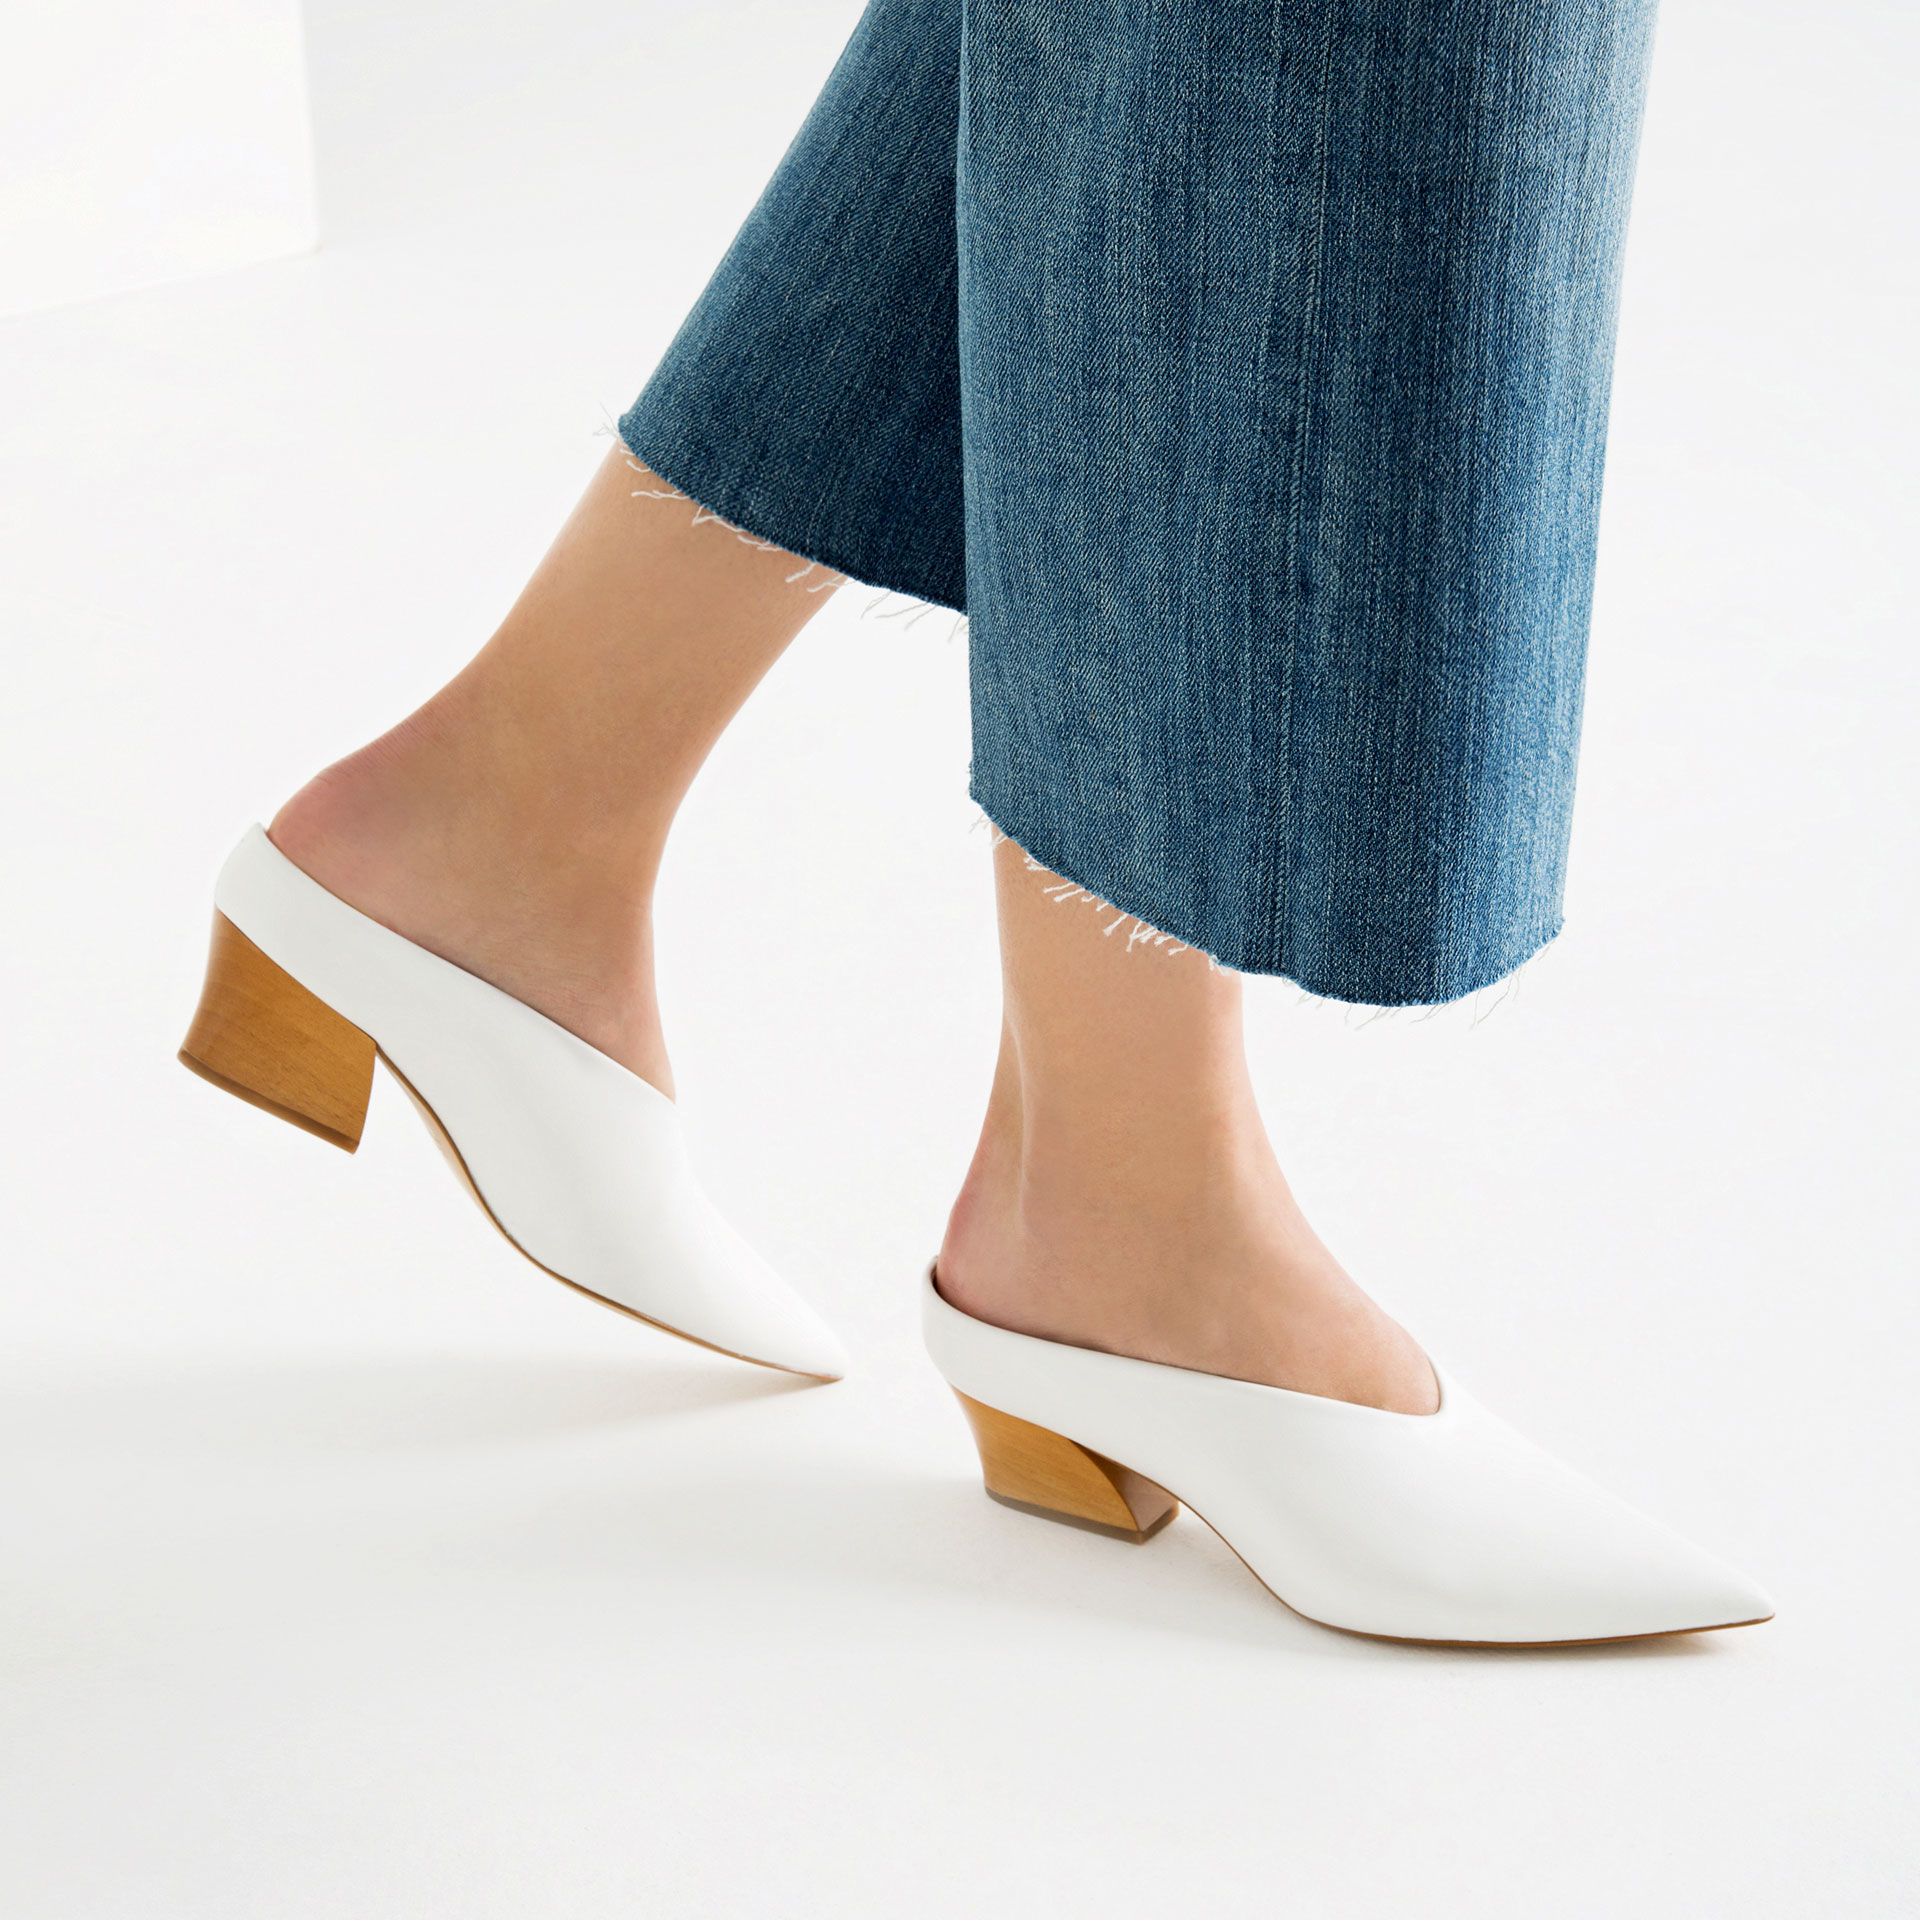 Zara Leather Mule Shoes